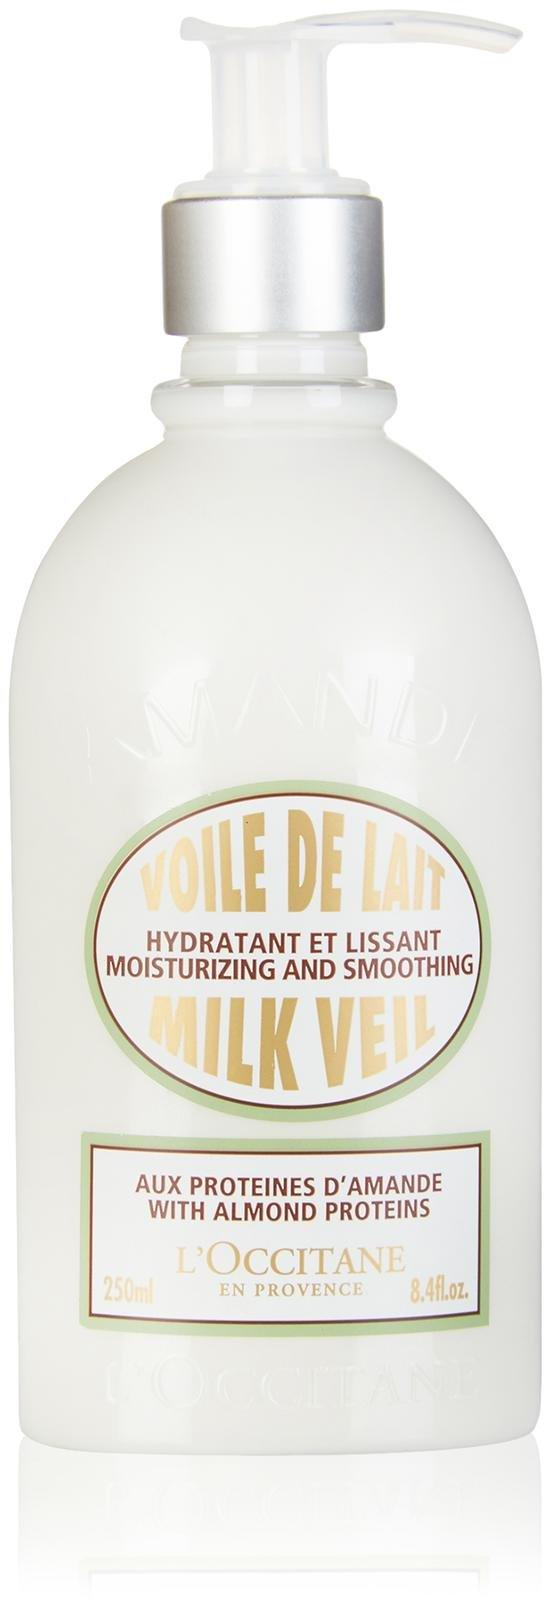 L'occitane Almond Milk Veil Smoothing Body Lotion